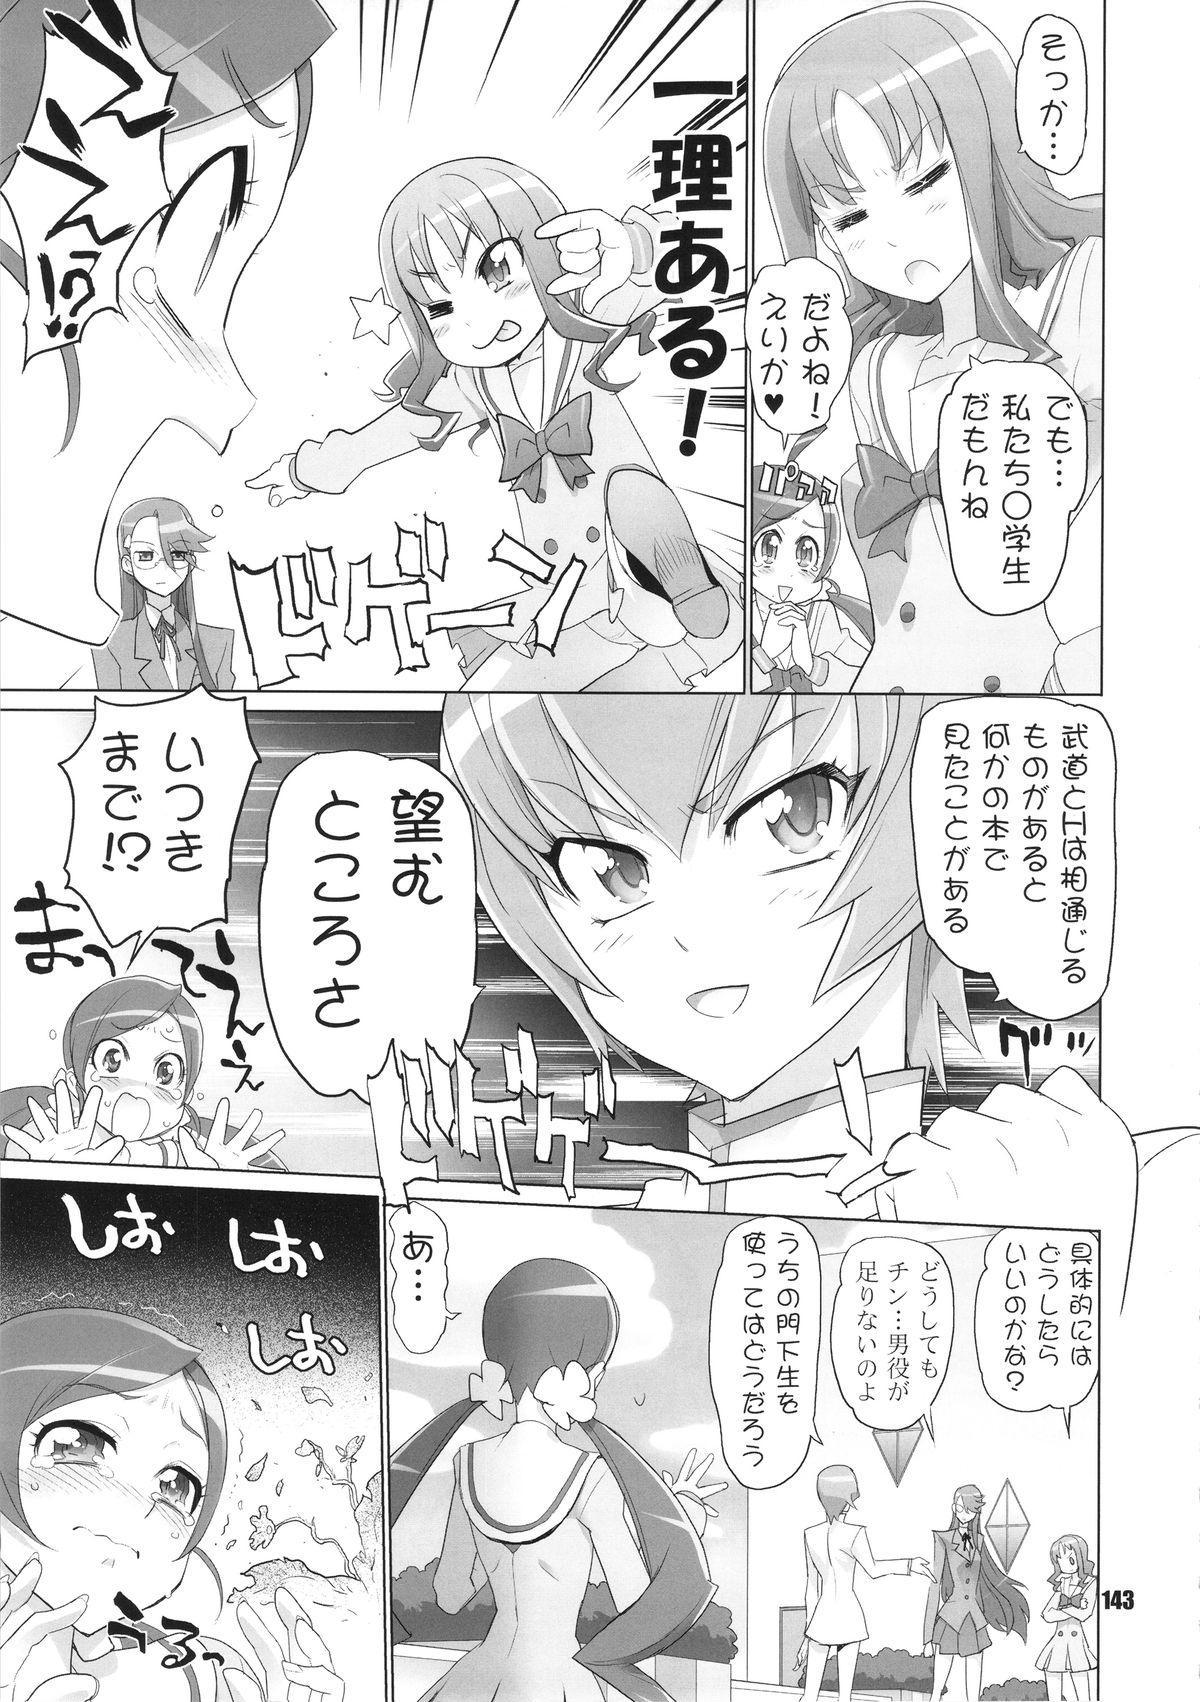 Inazuma Pretty Warrior 141